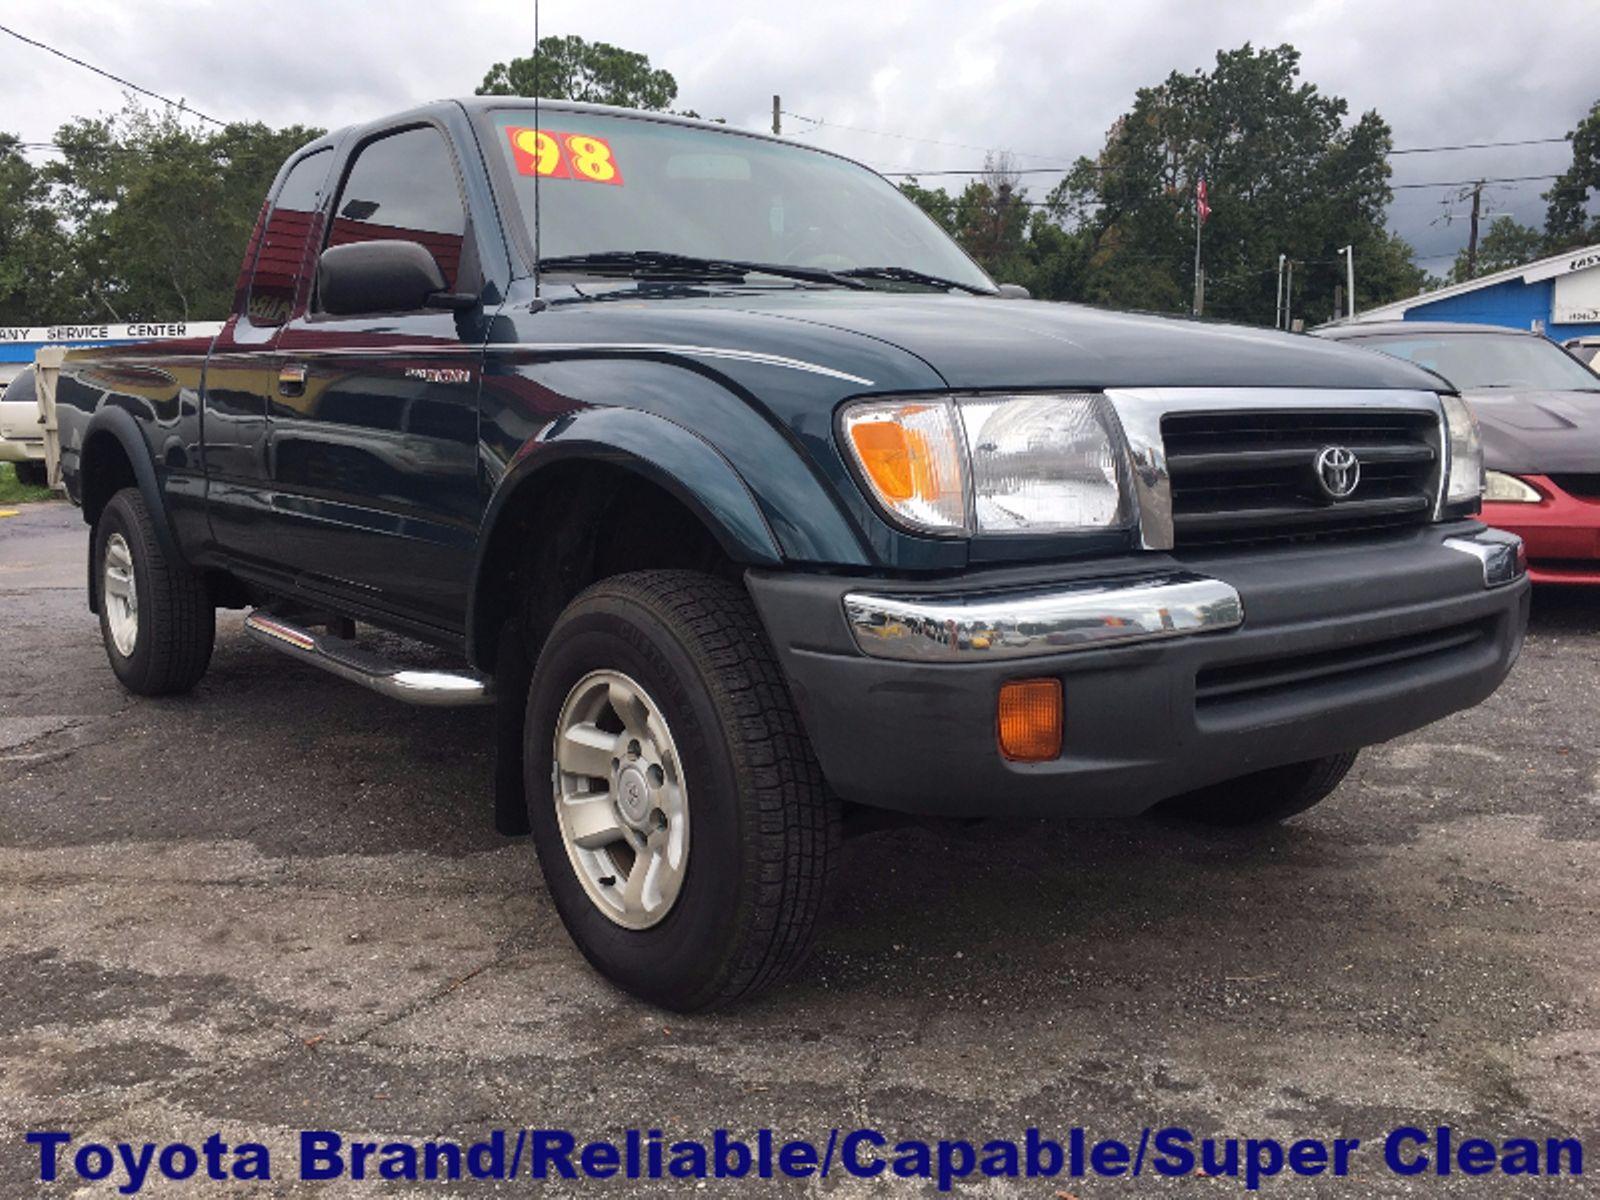 Cars For Sale Enterprise Jacksonvile Fl